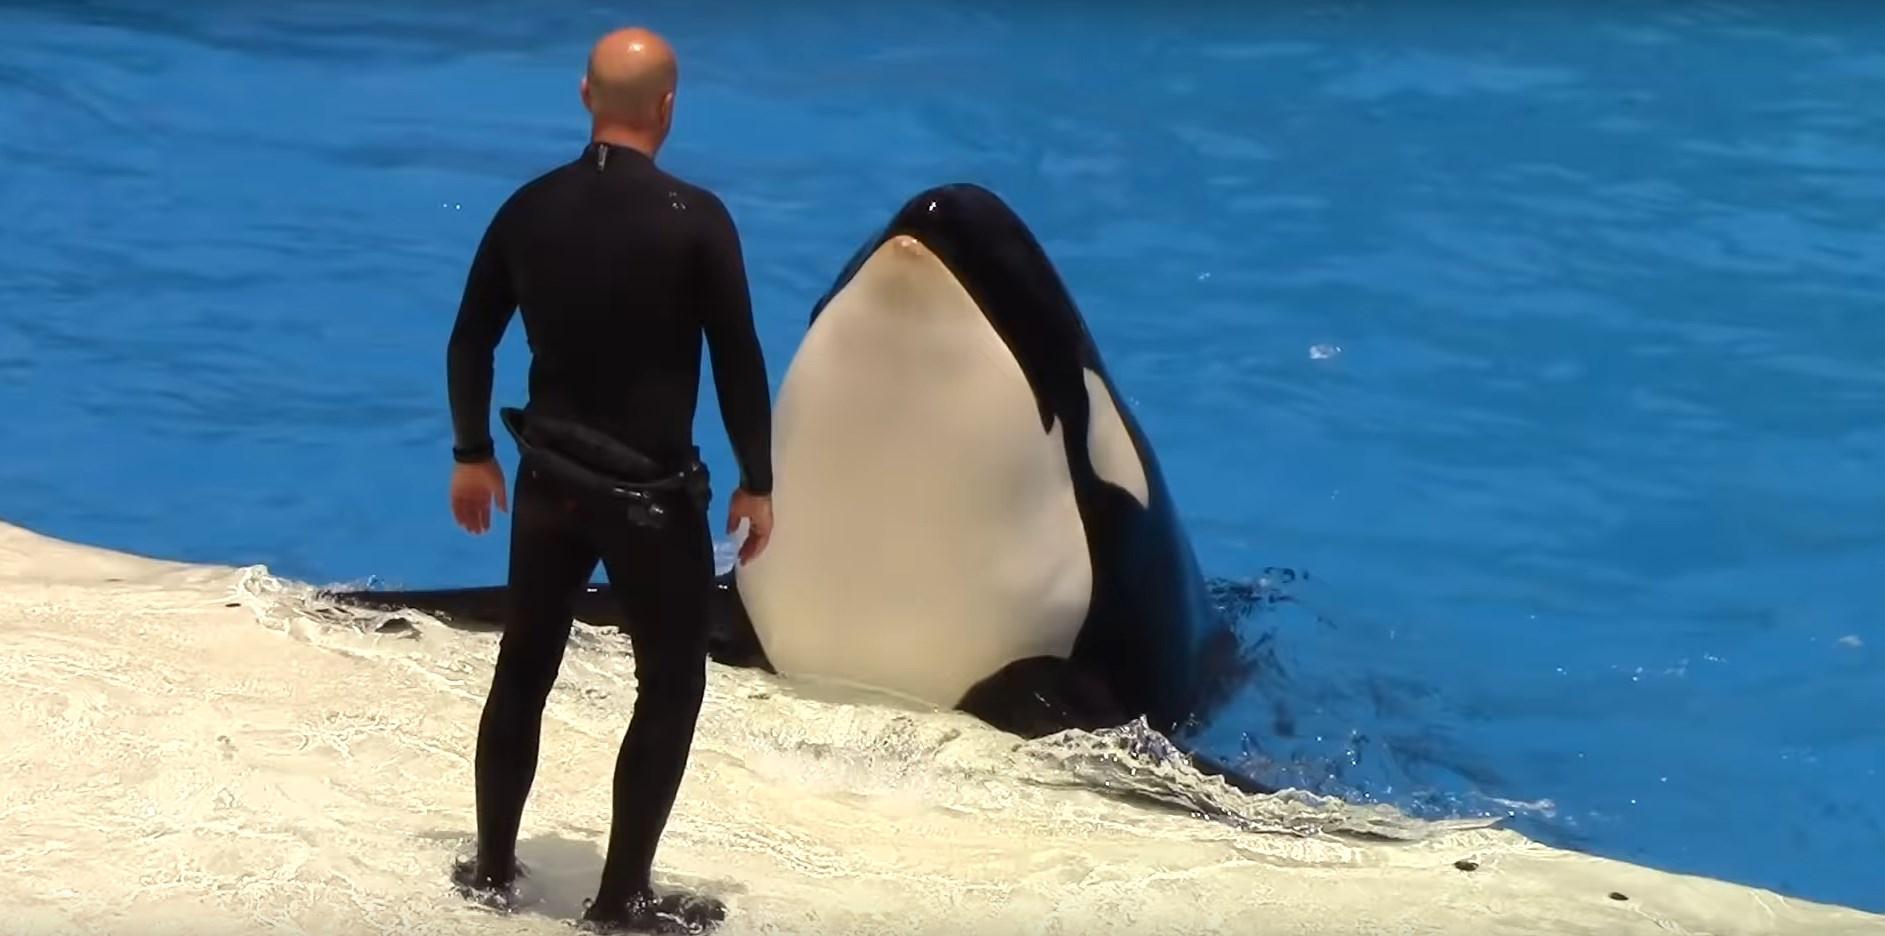 loro park teneryfa pokaz orka